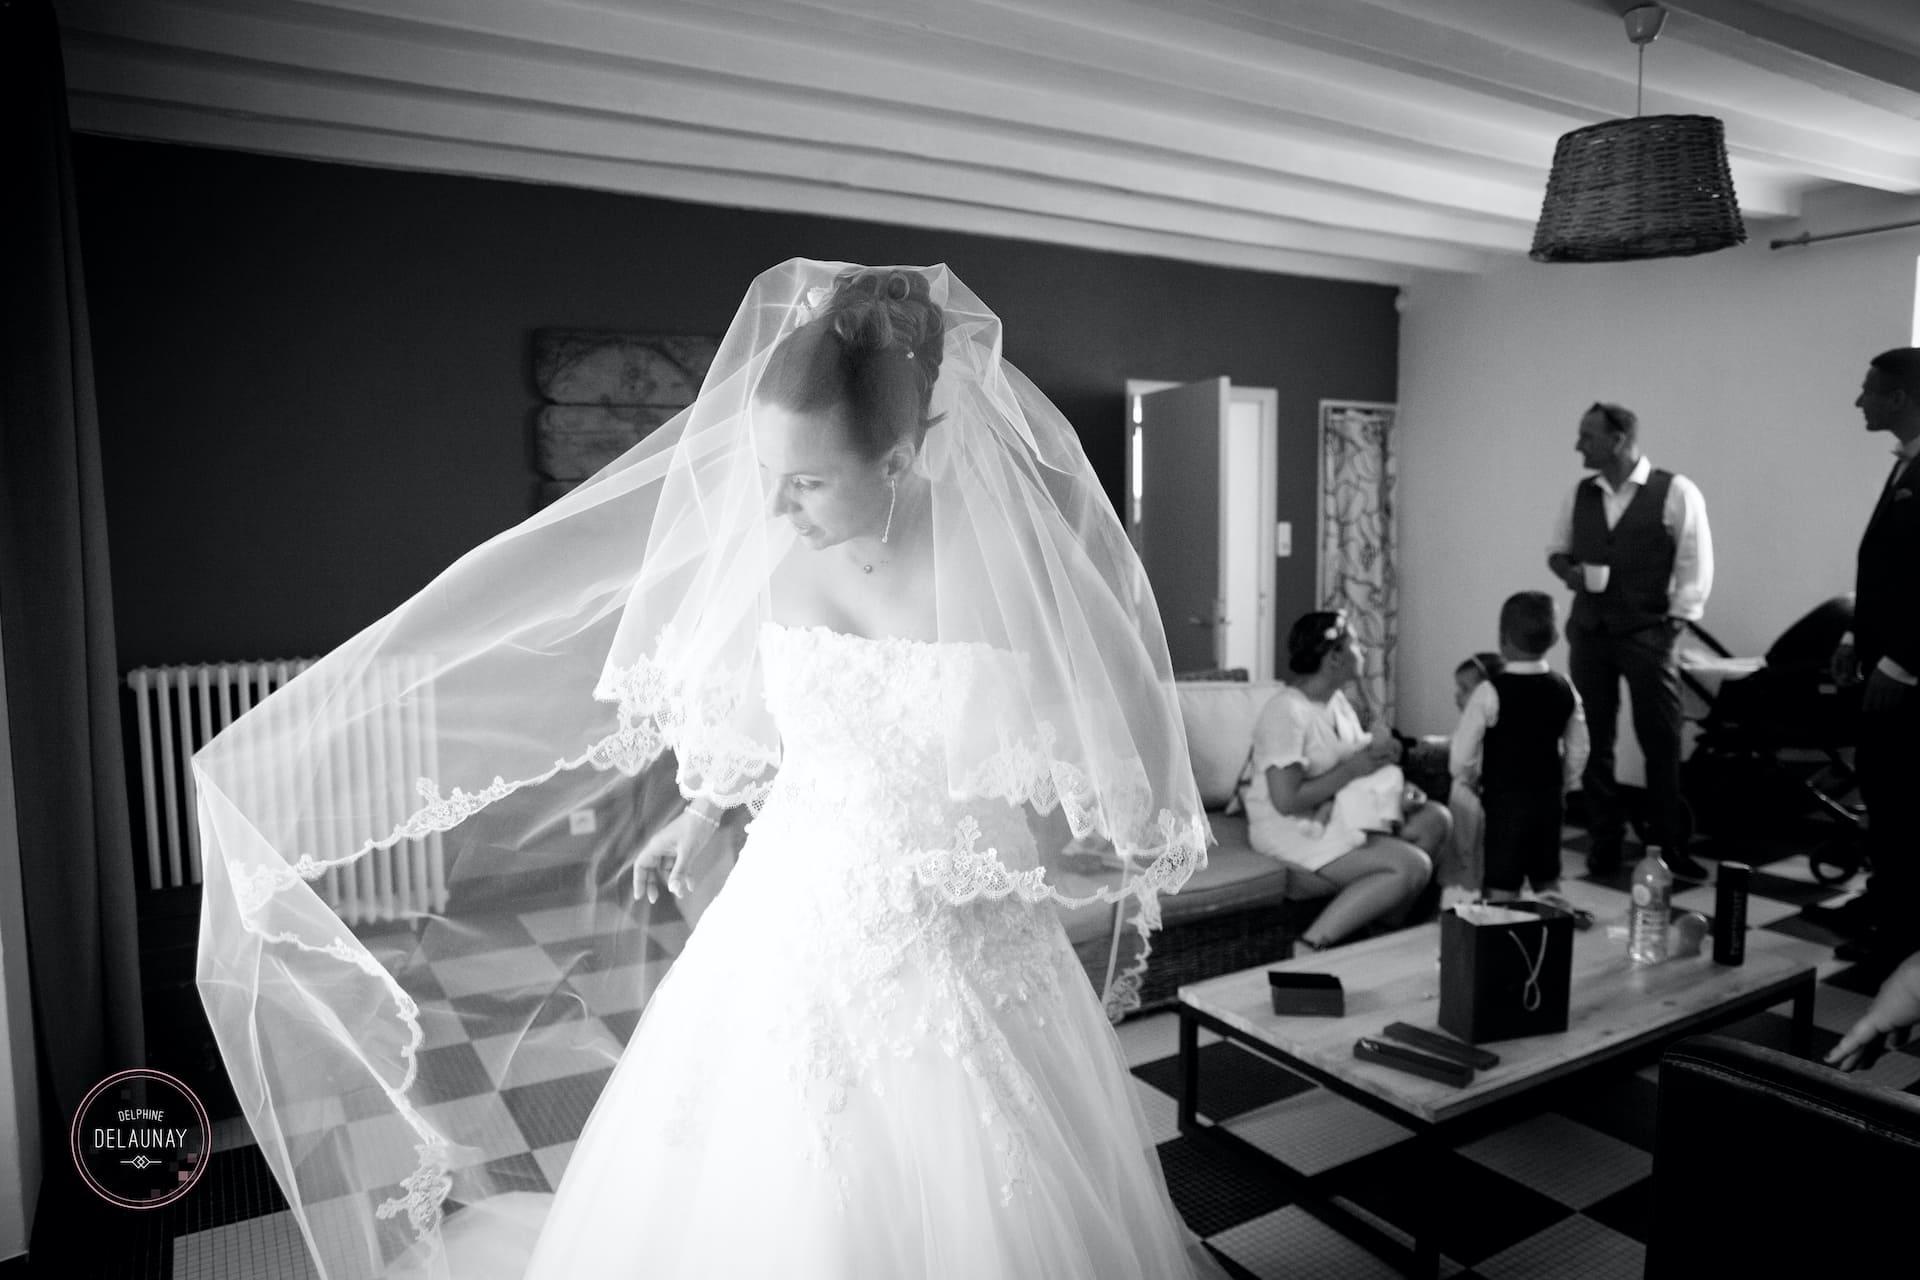 delphine-delaunay-photographe-savenay-mariage-51